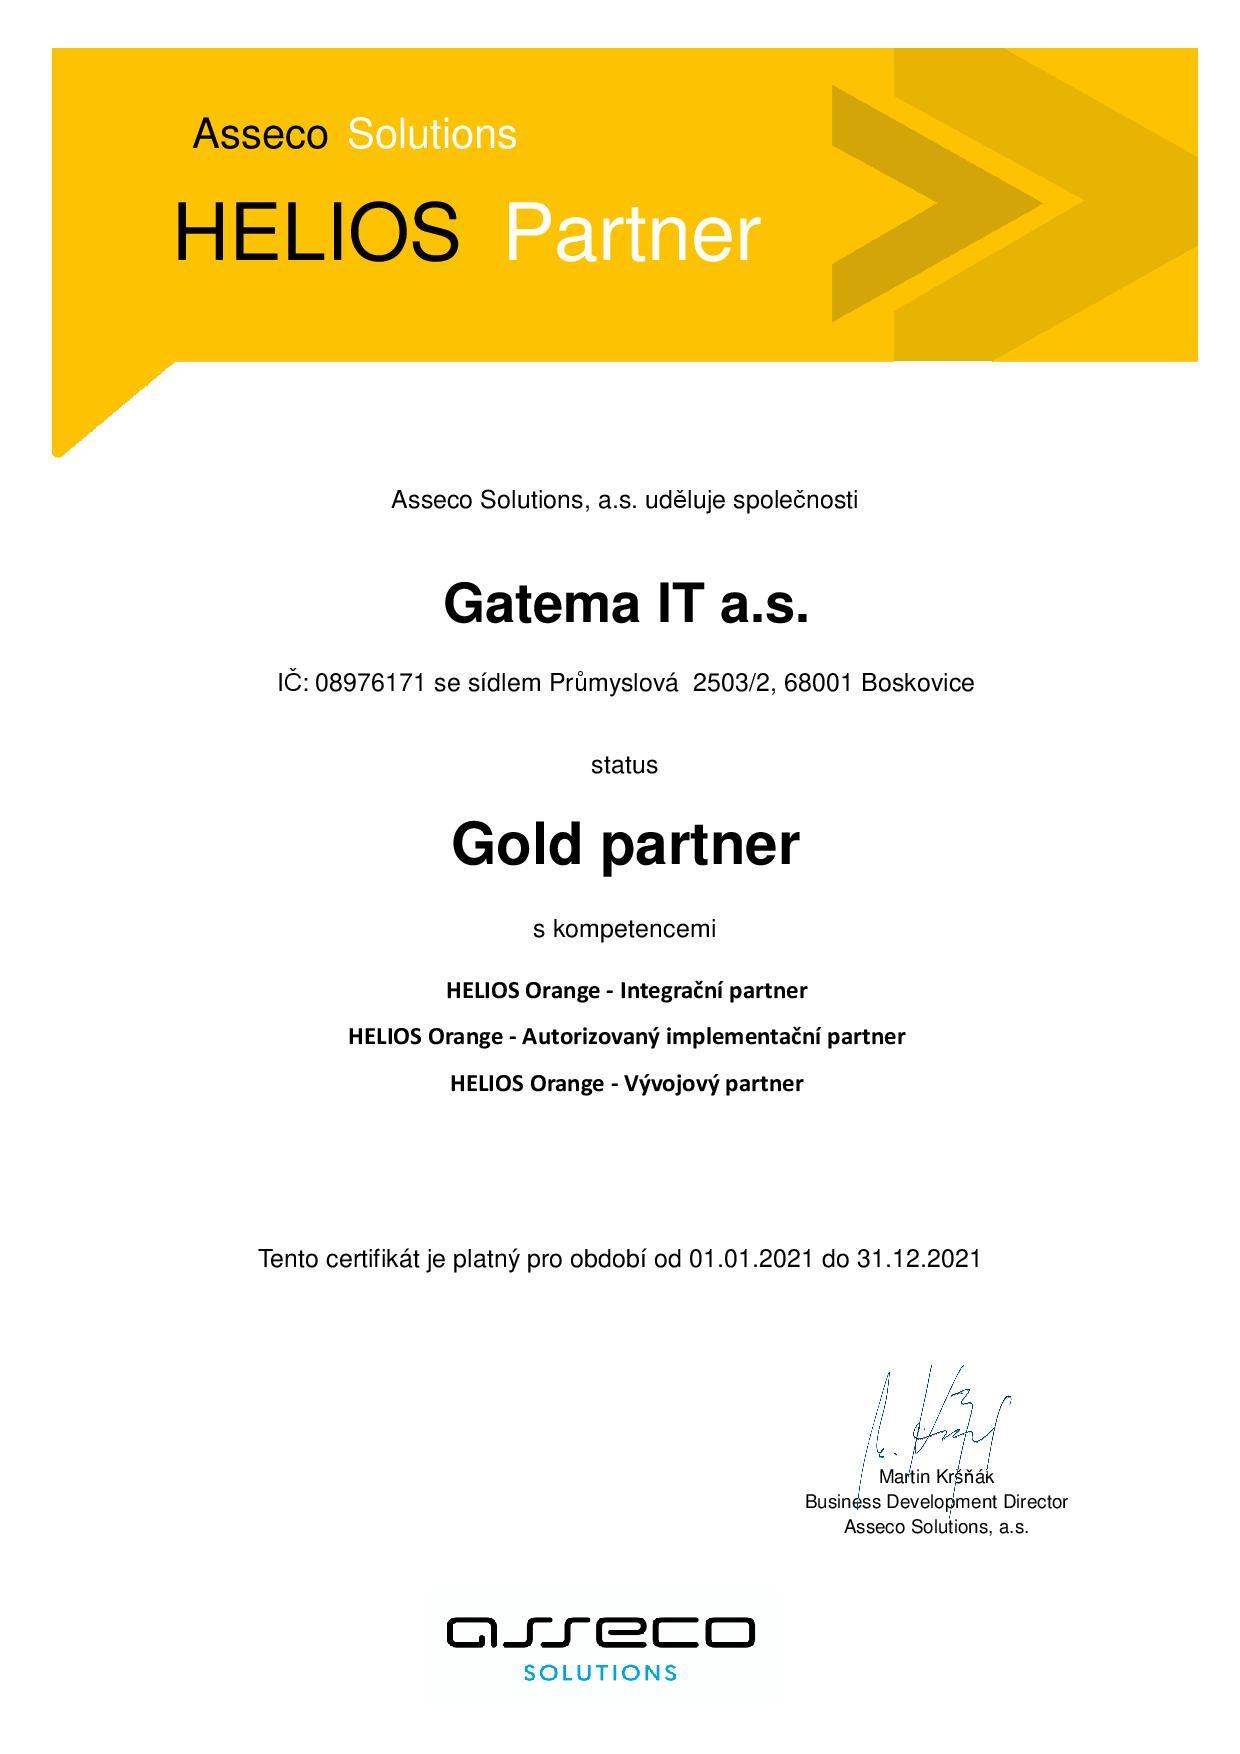 Certifikát Gatema HELIOS Gold partner